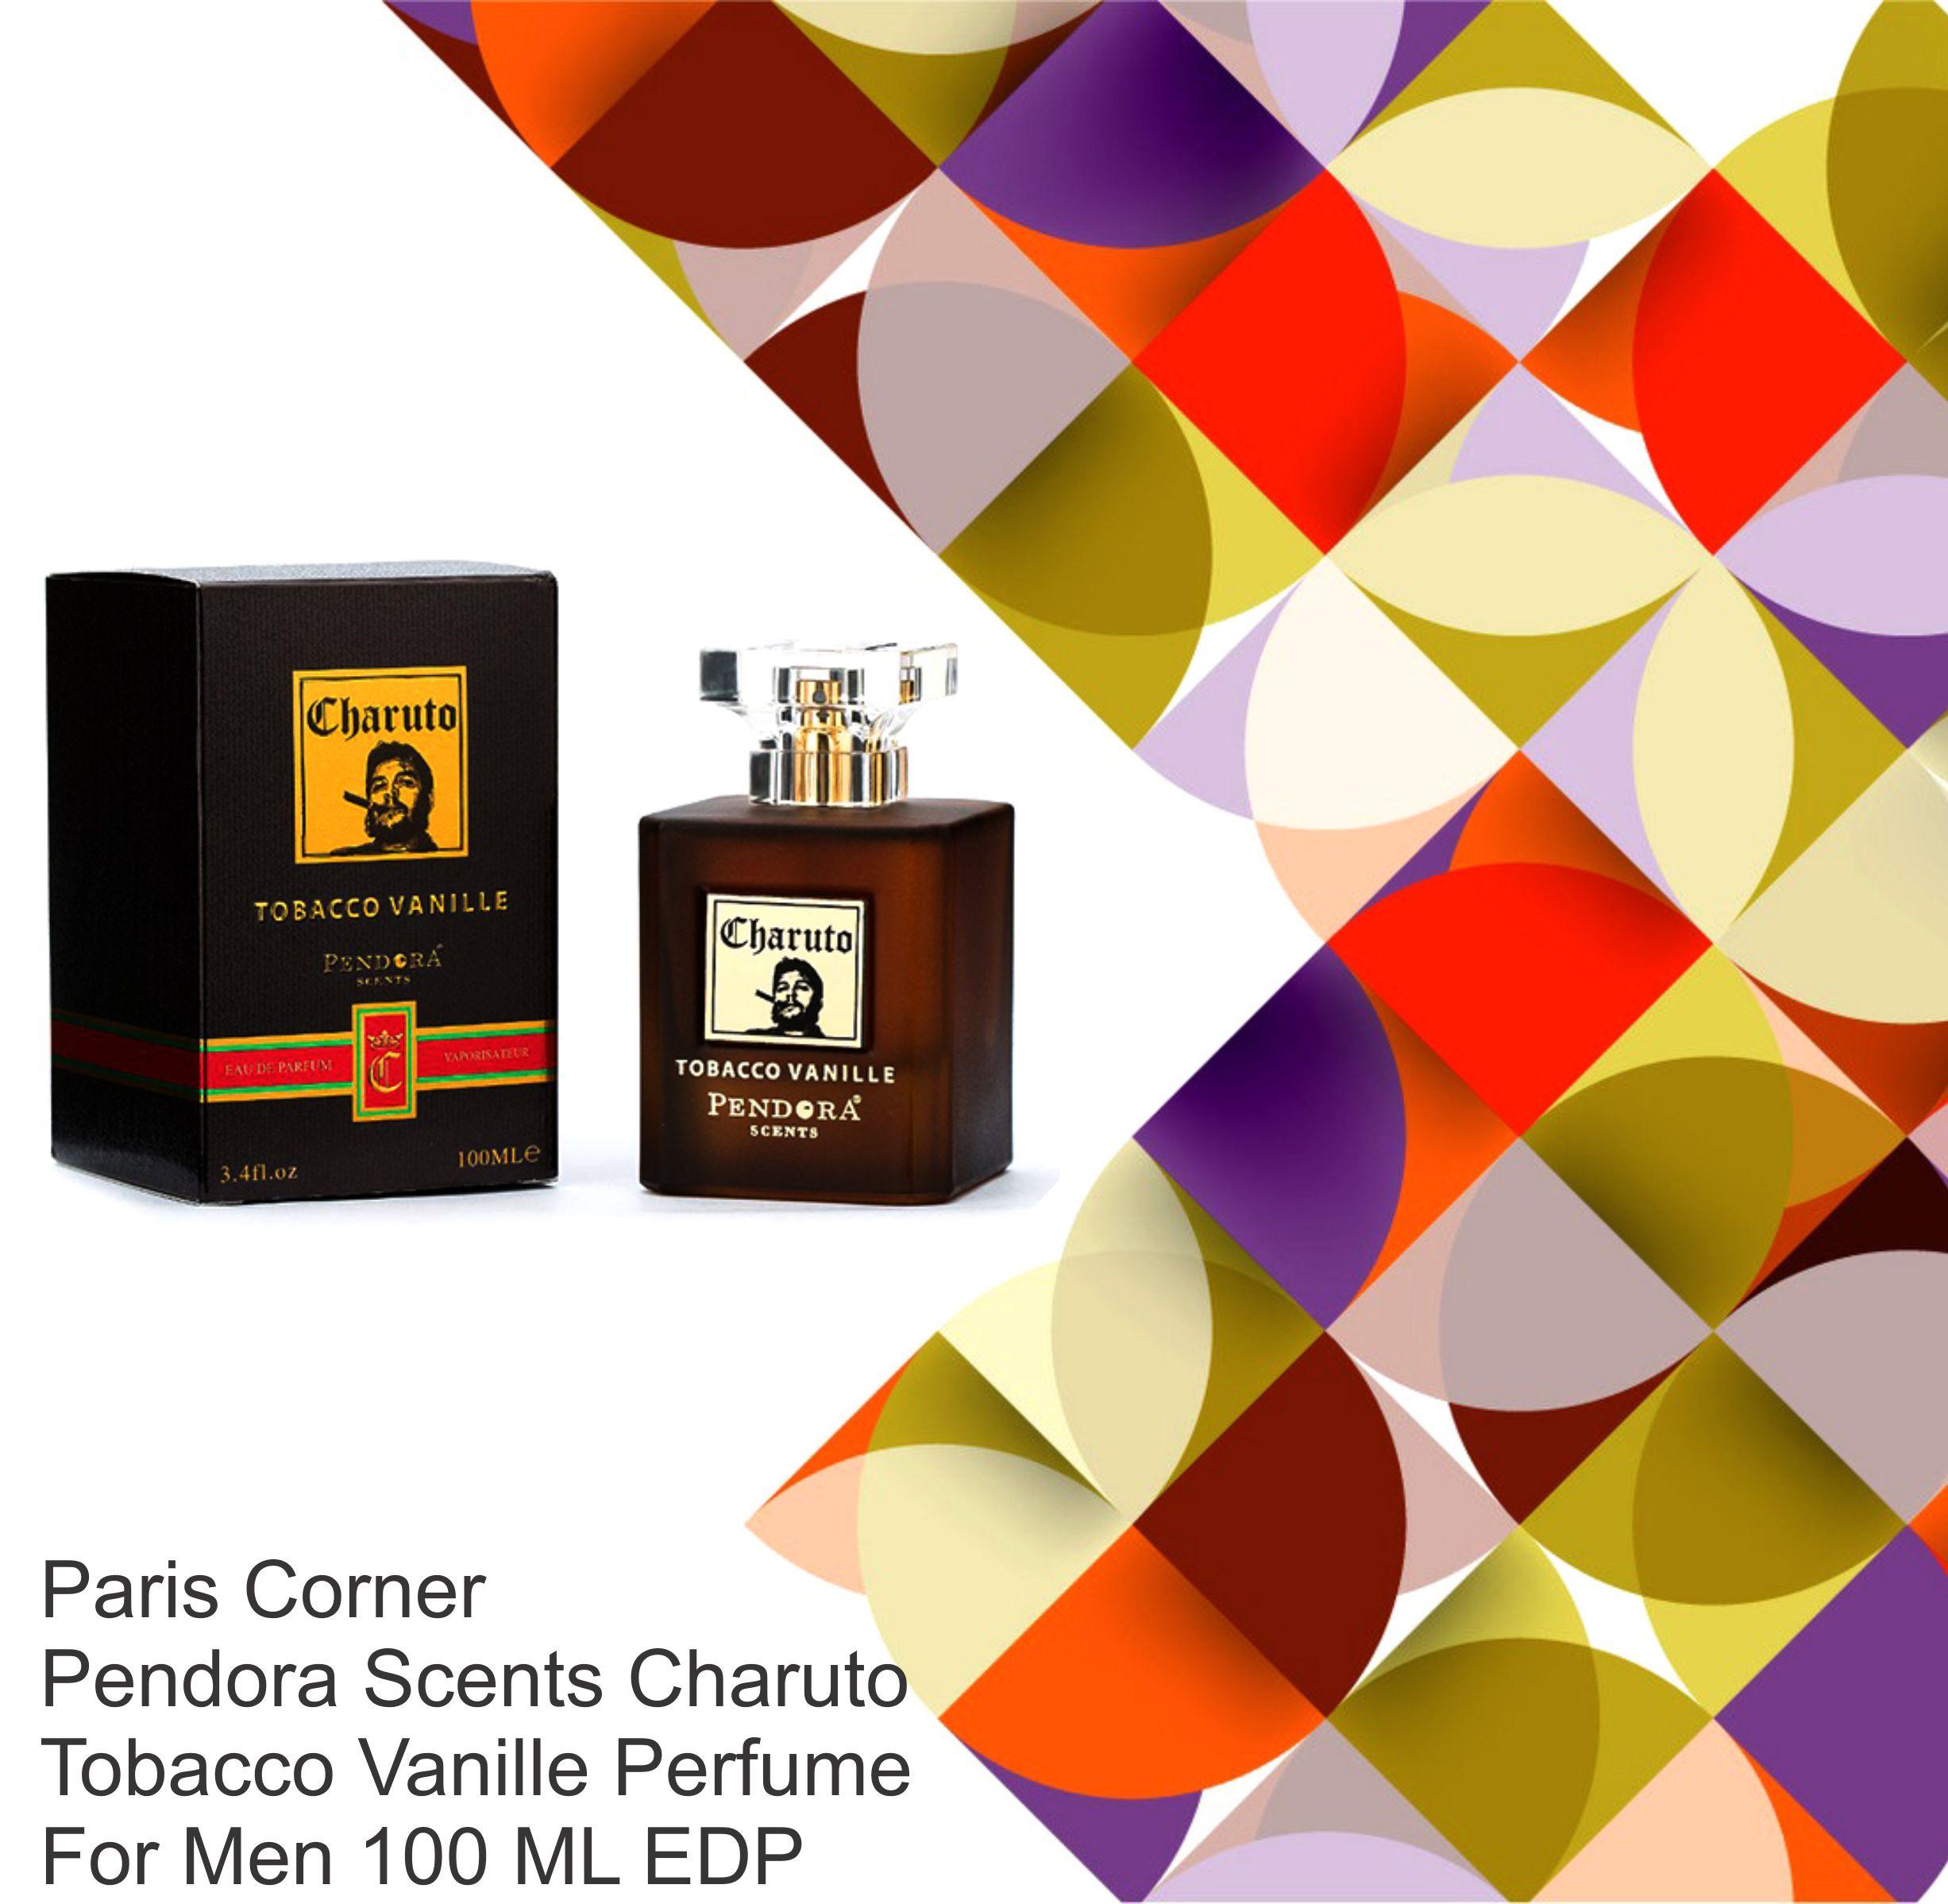 pendora-scents-charuto-tobacco-vanille-for-men-perfume-for-men-100-ml-edp